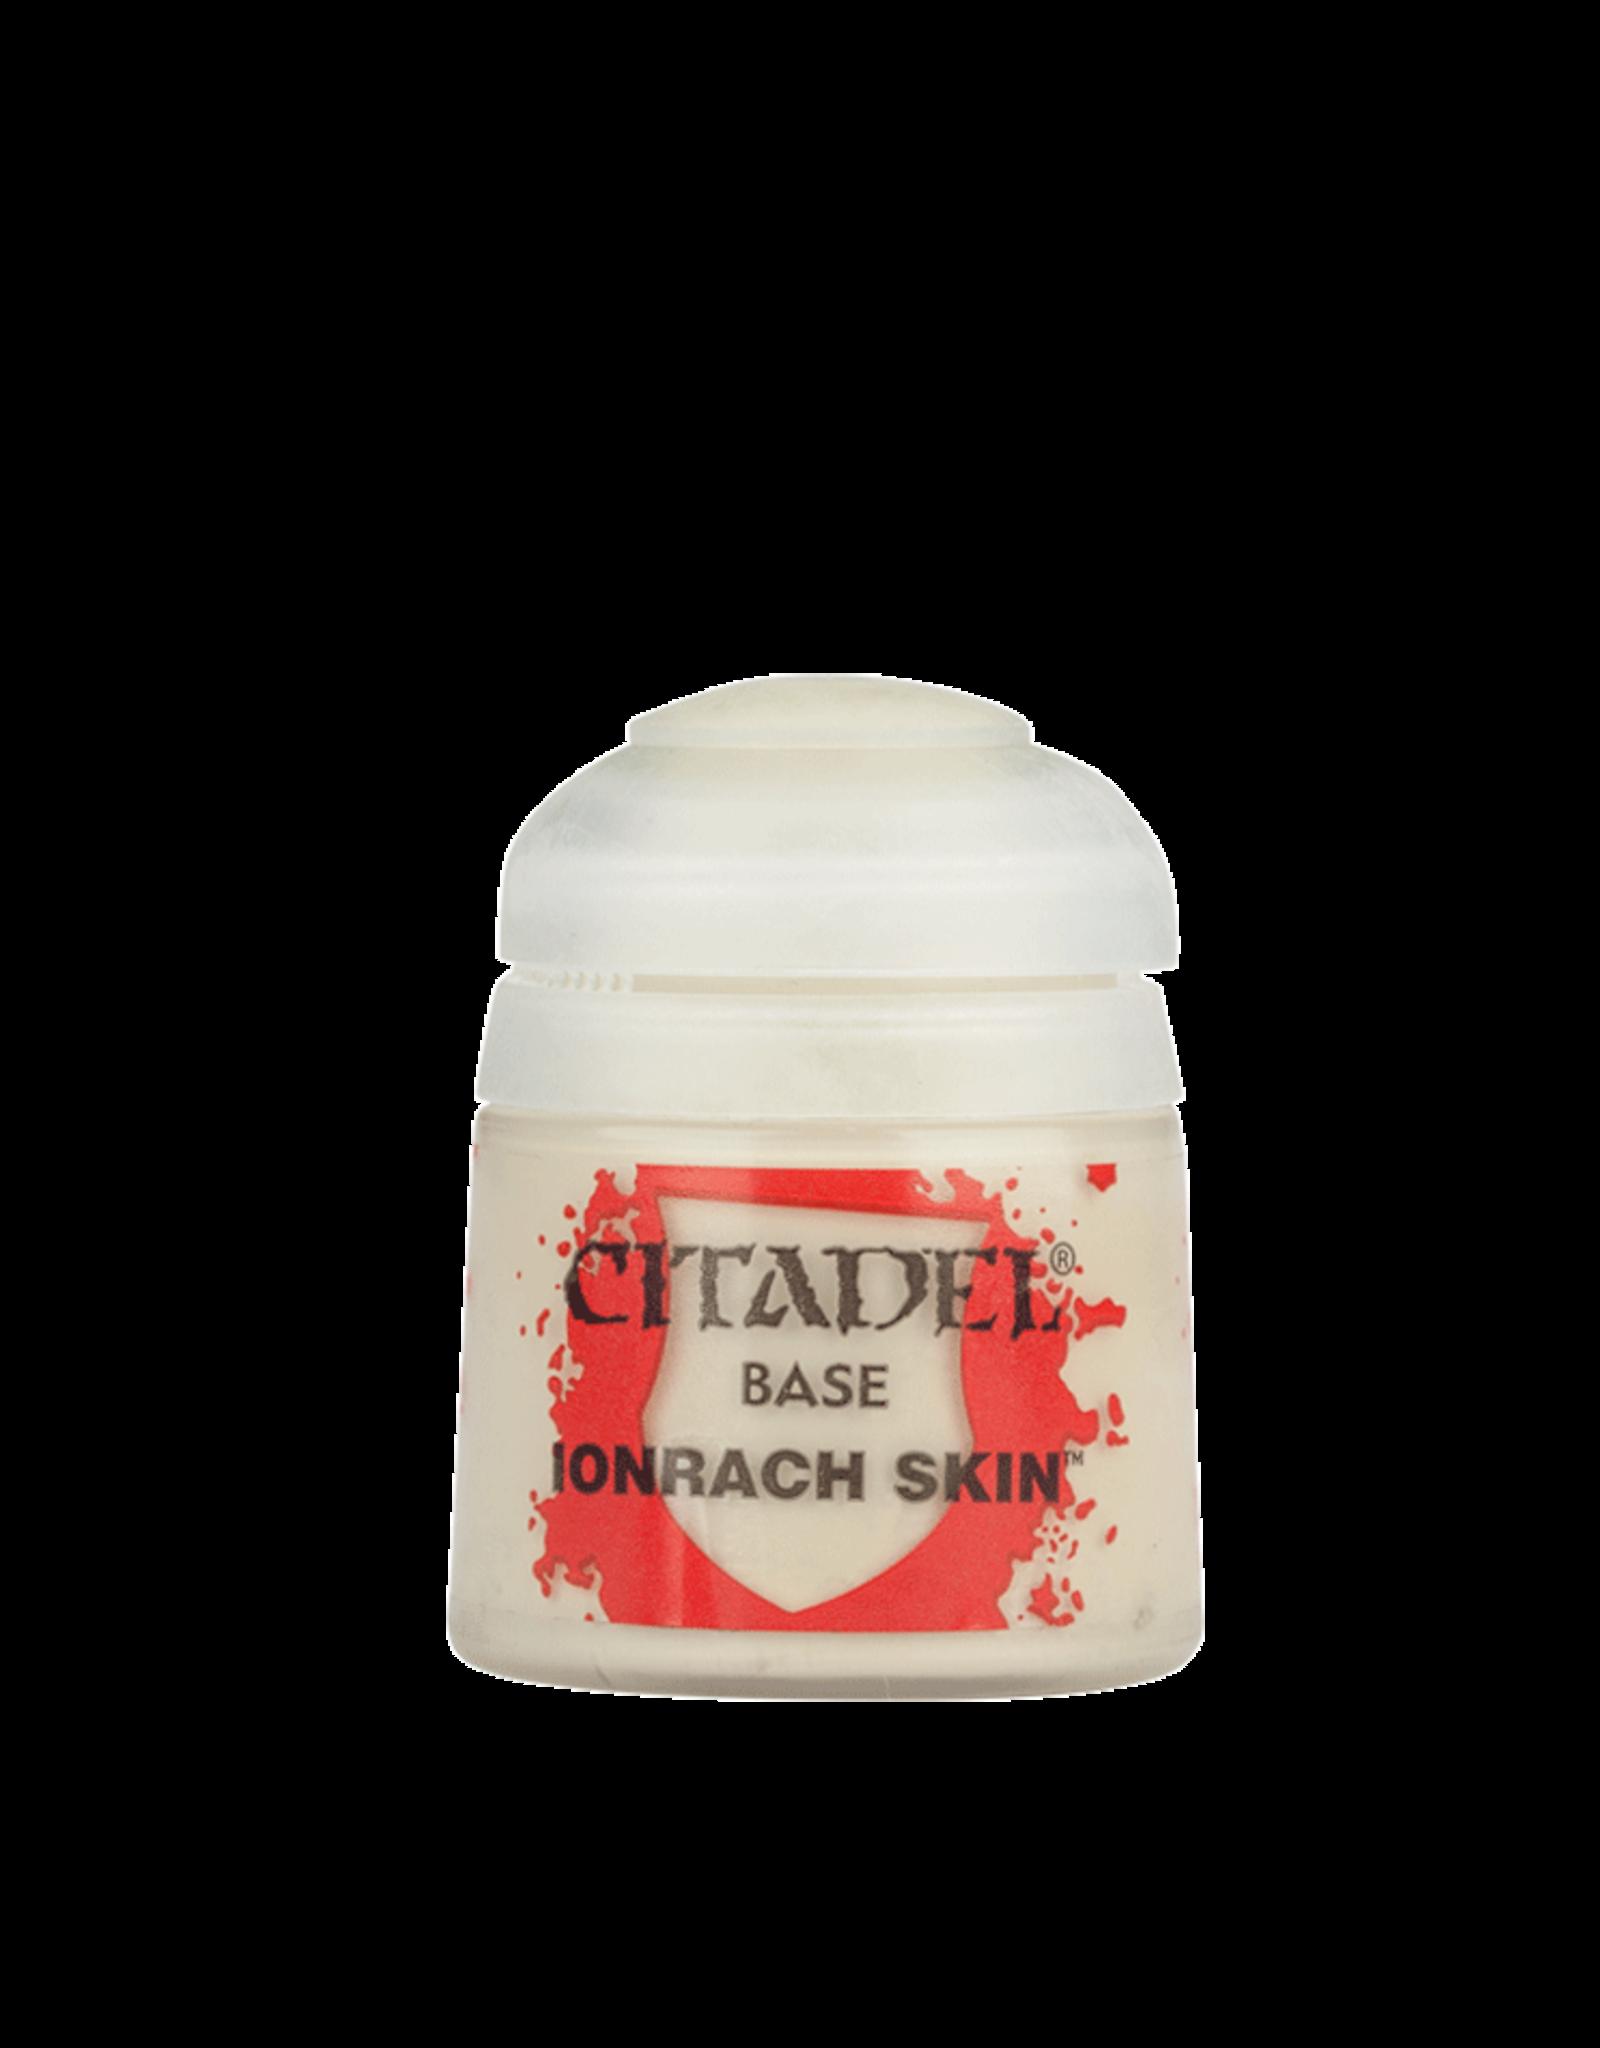 Citadel Citadel Base: Ionrach skin (12ml)